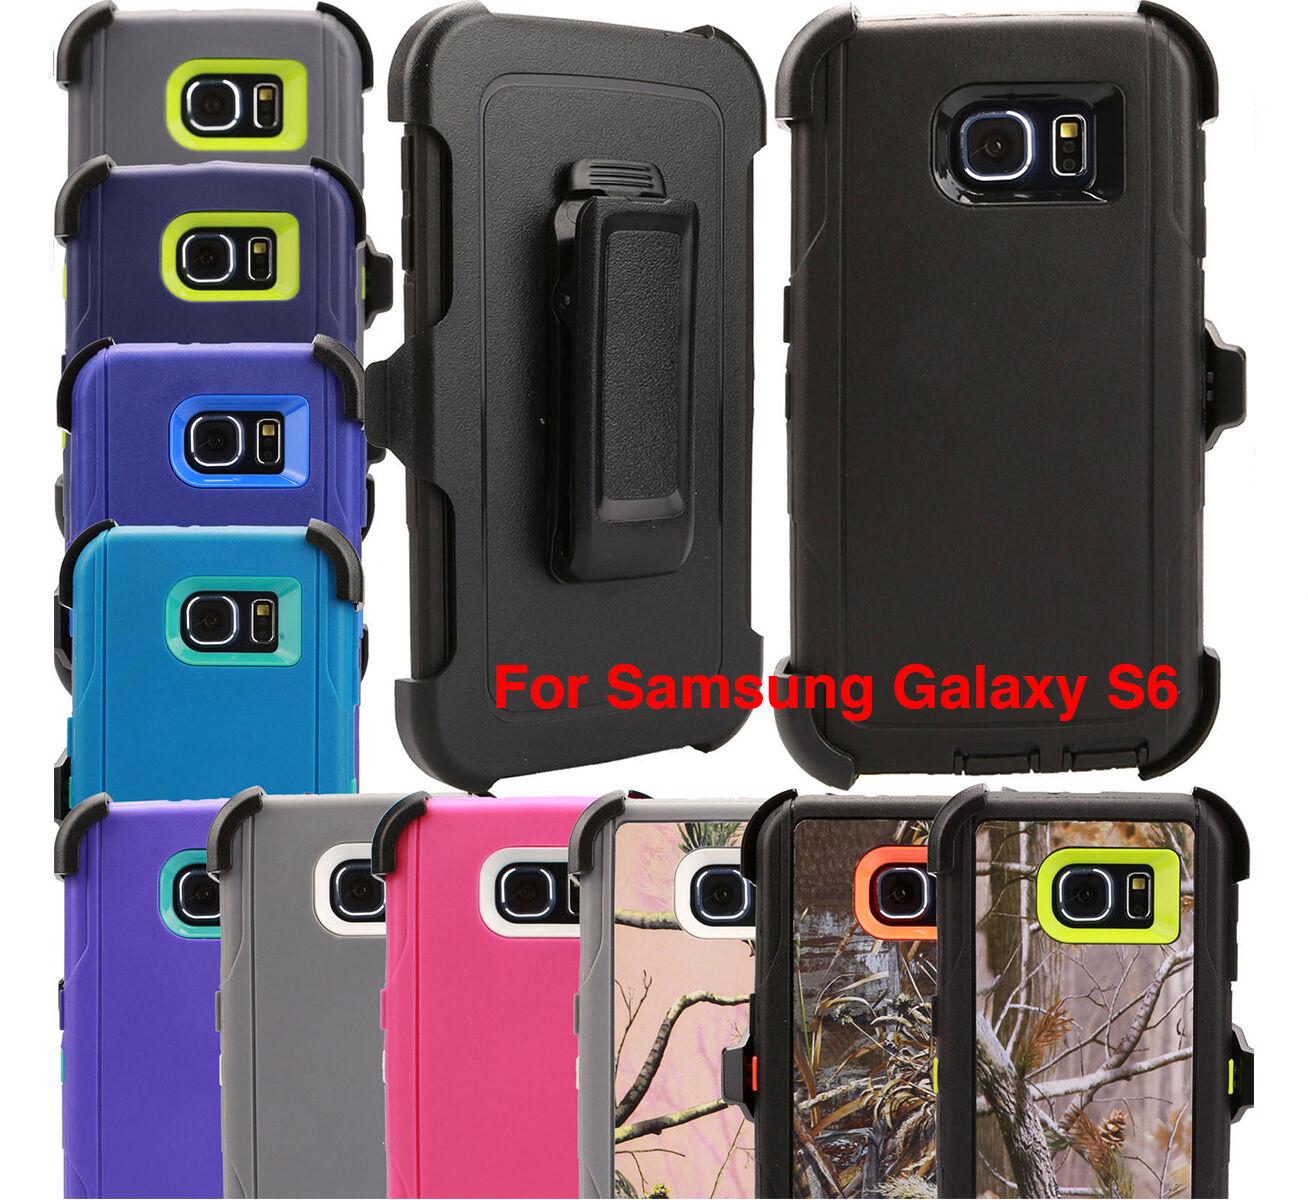 Galaxy S6 Otterbox: For Samsung Galaxy S6 Regular Case (Belt Holster Fits